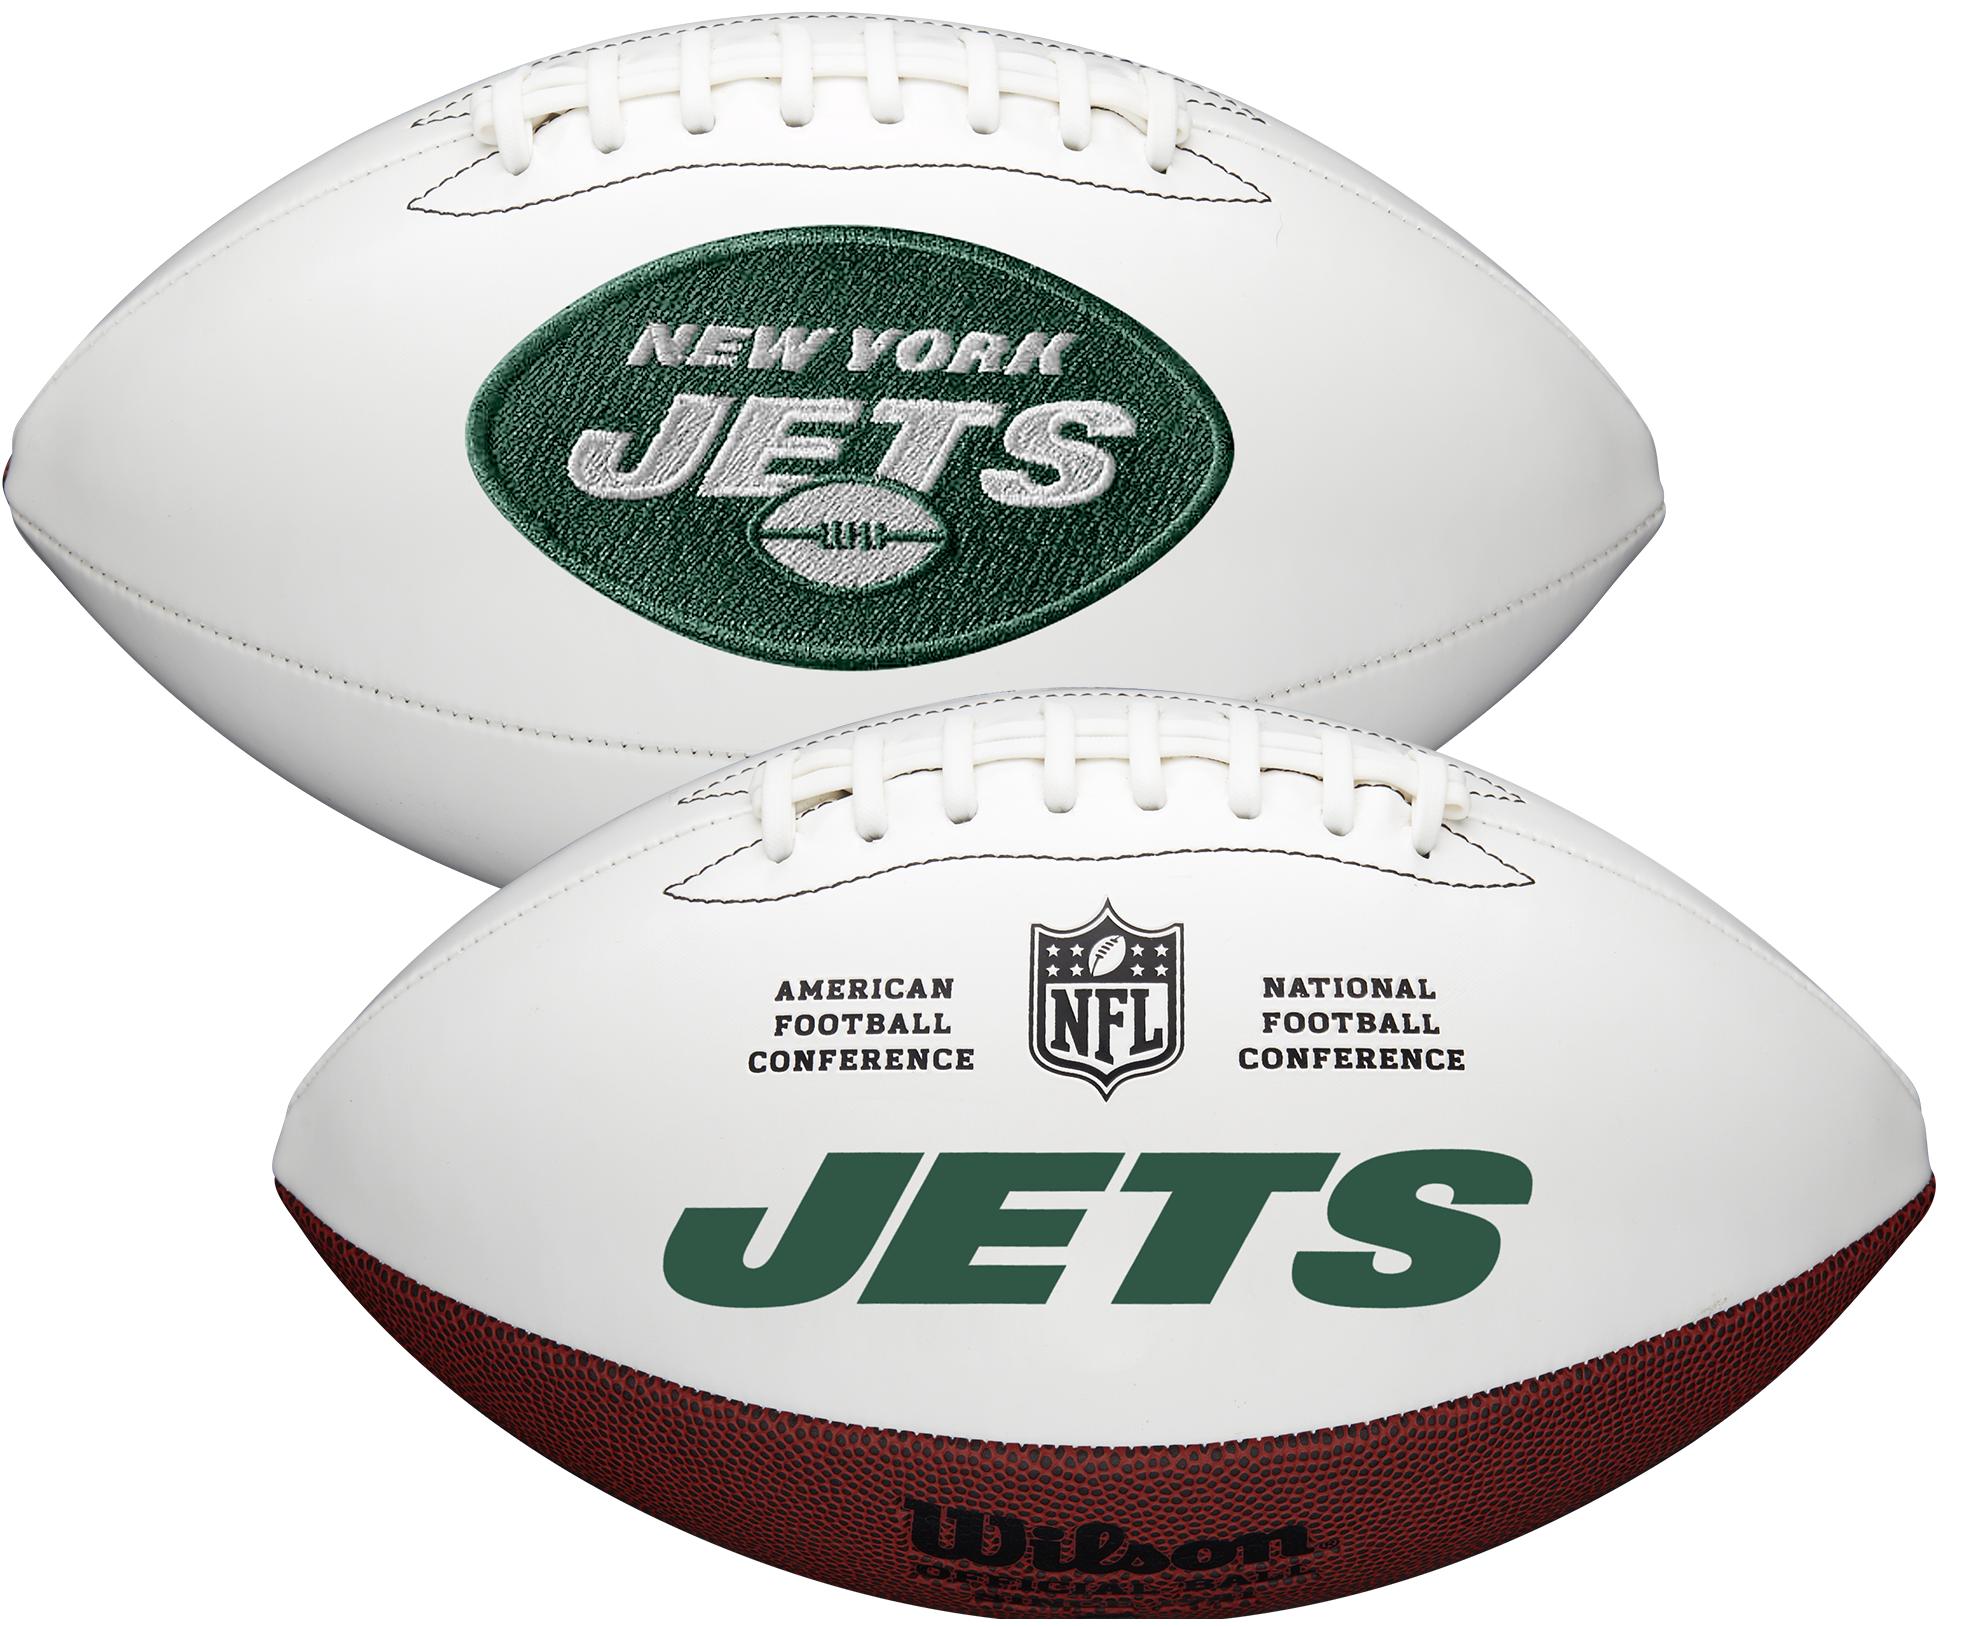 Wilson New York Jets Official NFL Autograph Series Football